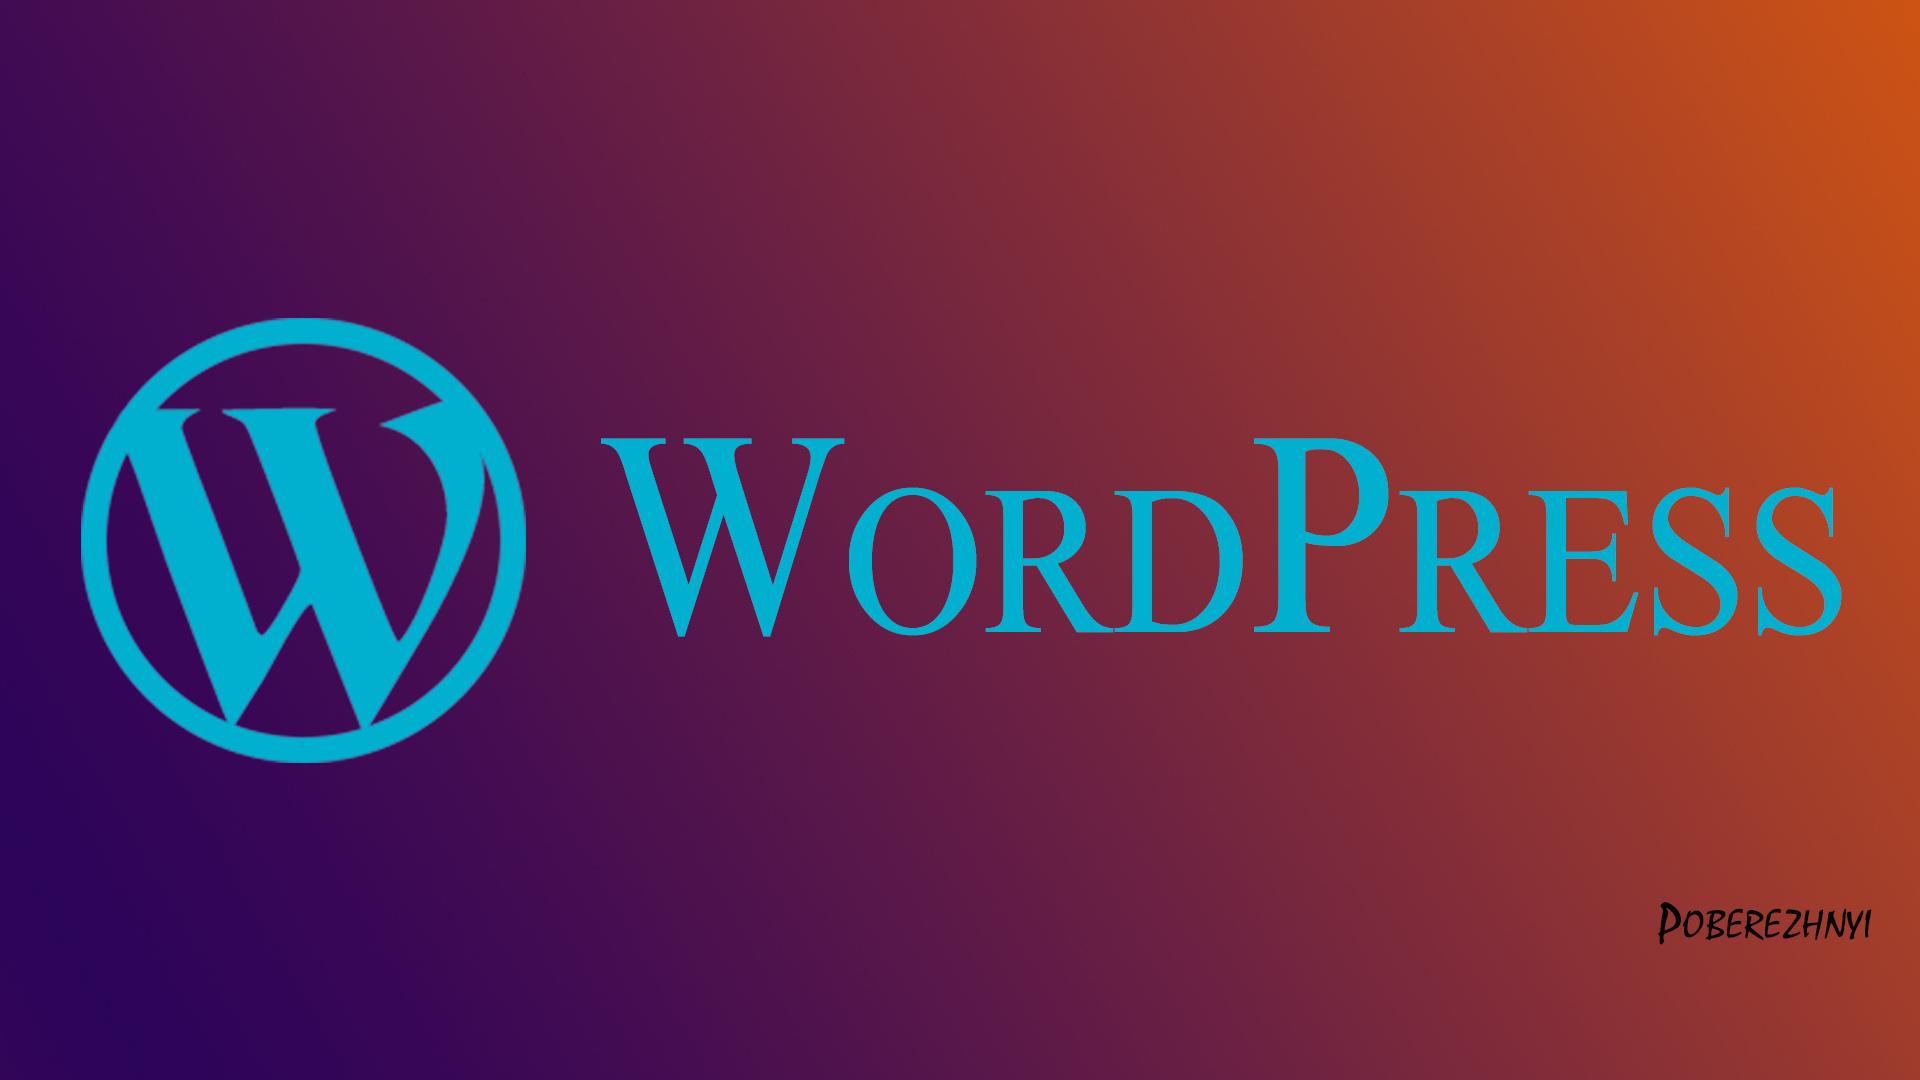 Images of WordPress Logo Size - #rock-cafe